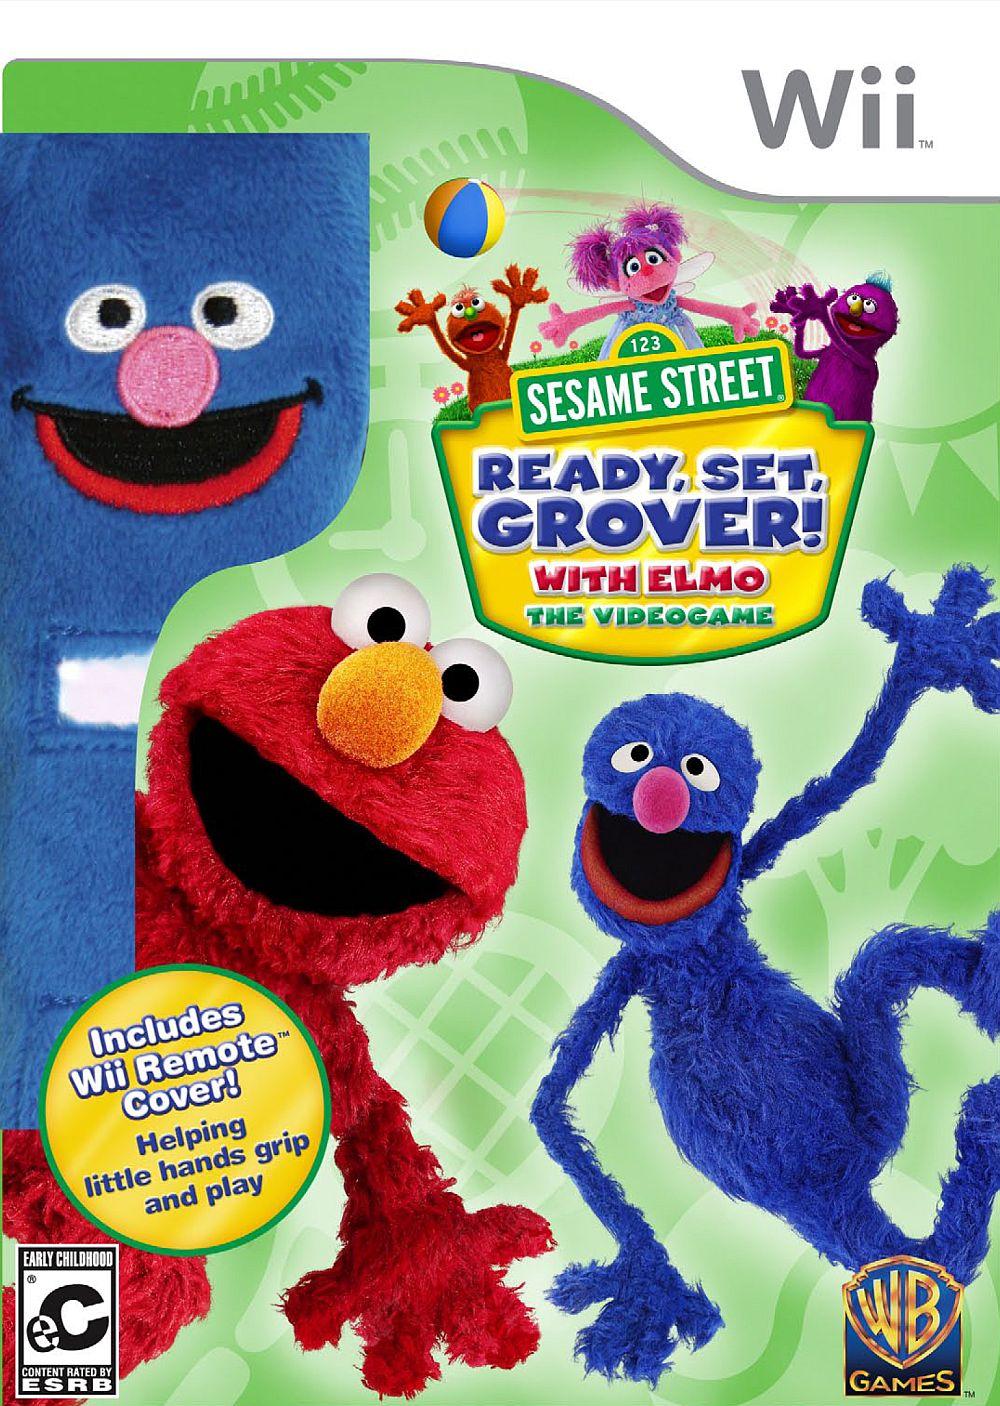 Sesame Street: Ready, Set Grover!